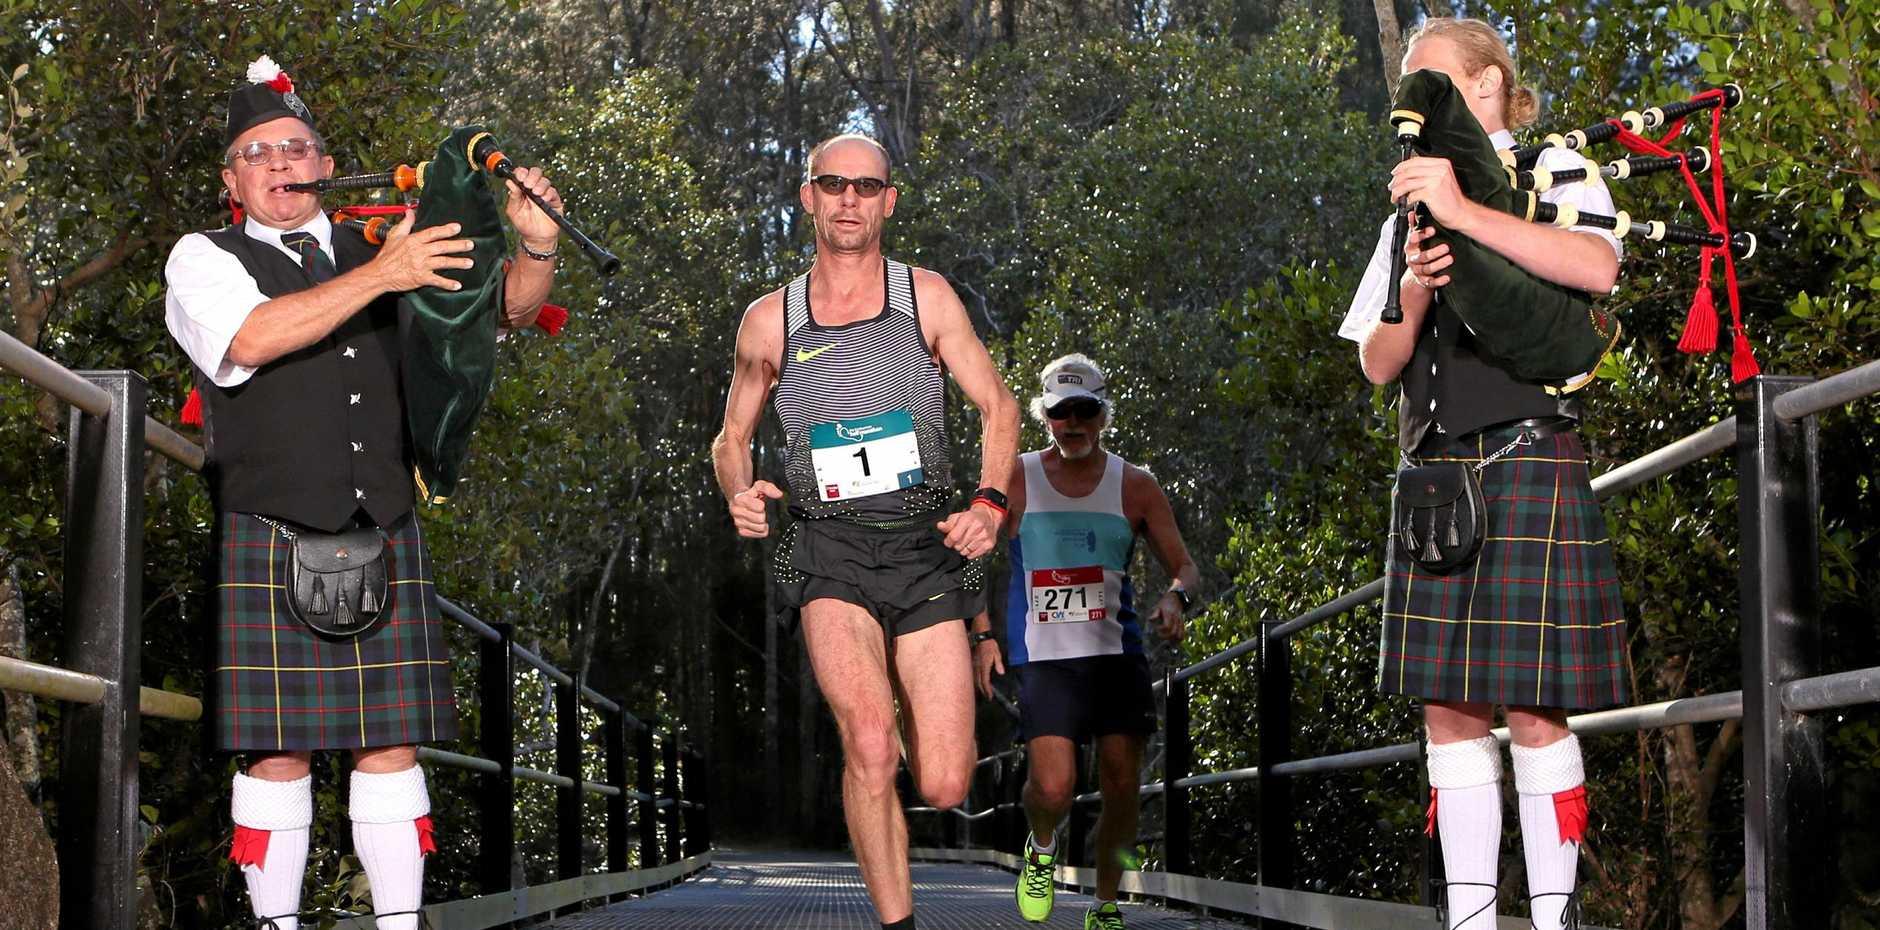 PIPERS PLAY: Steve Moneghetti returns for the 2018 Coffs Harbour Running Festival.